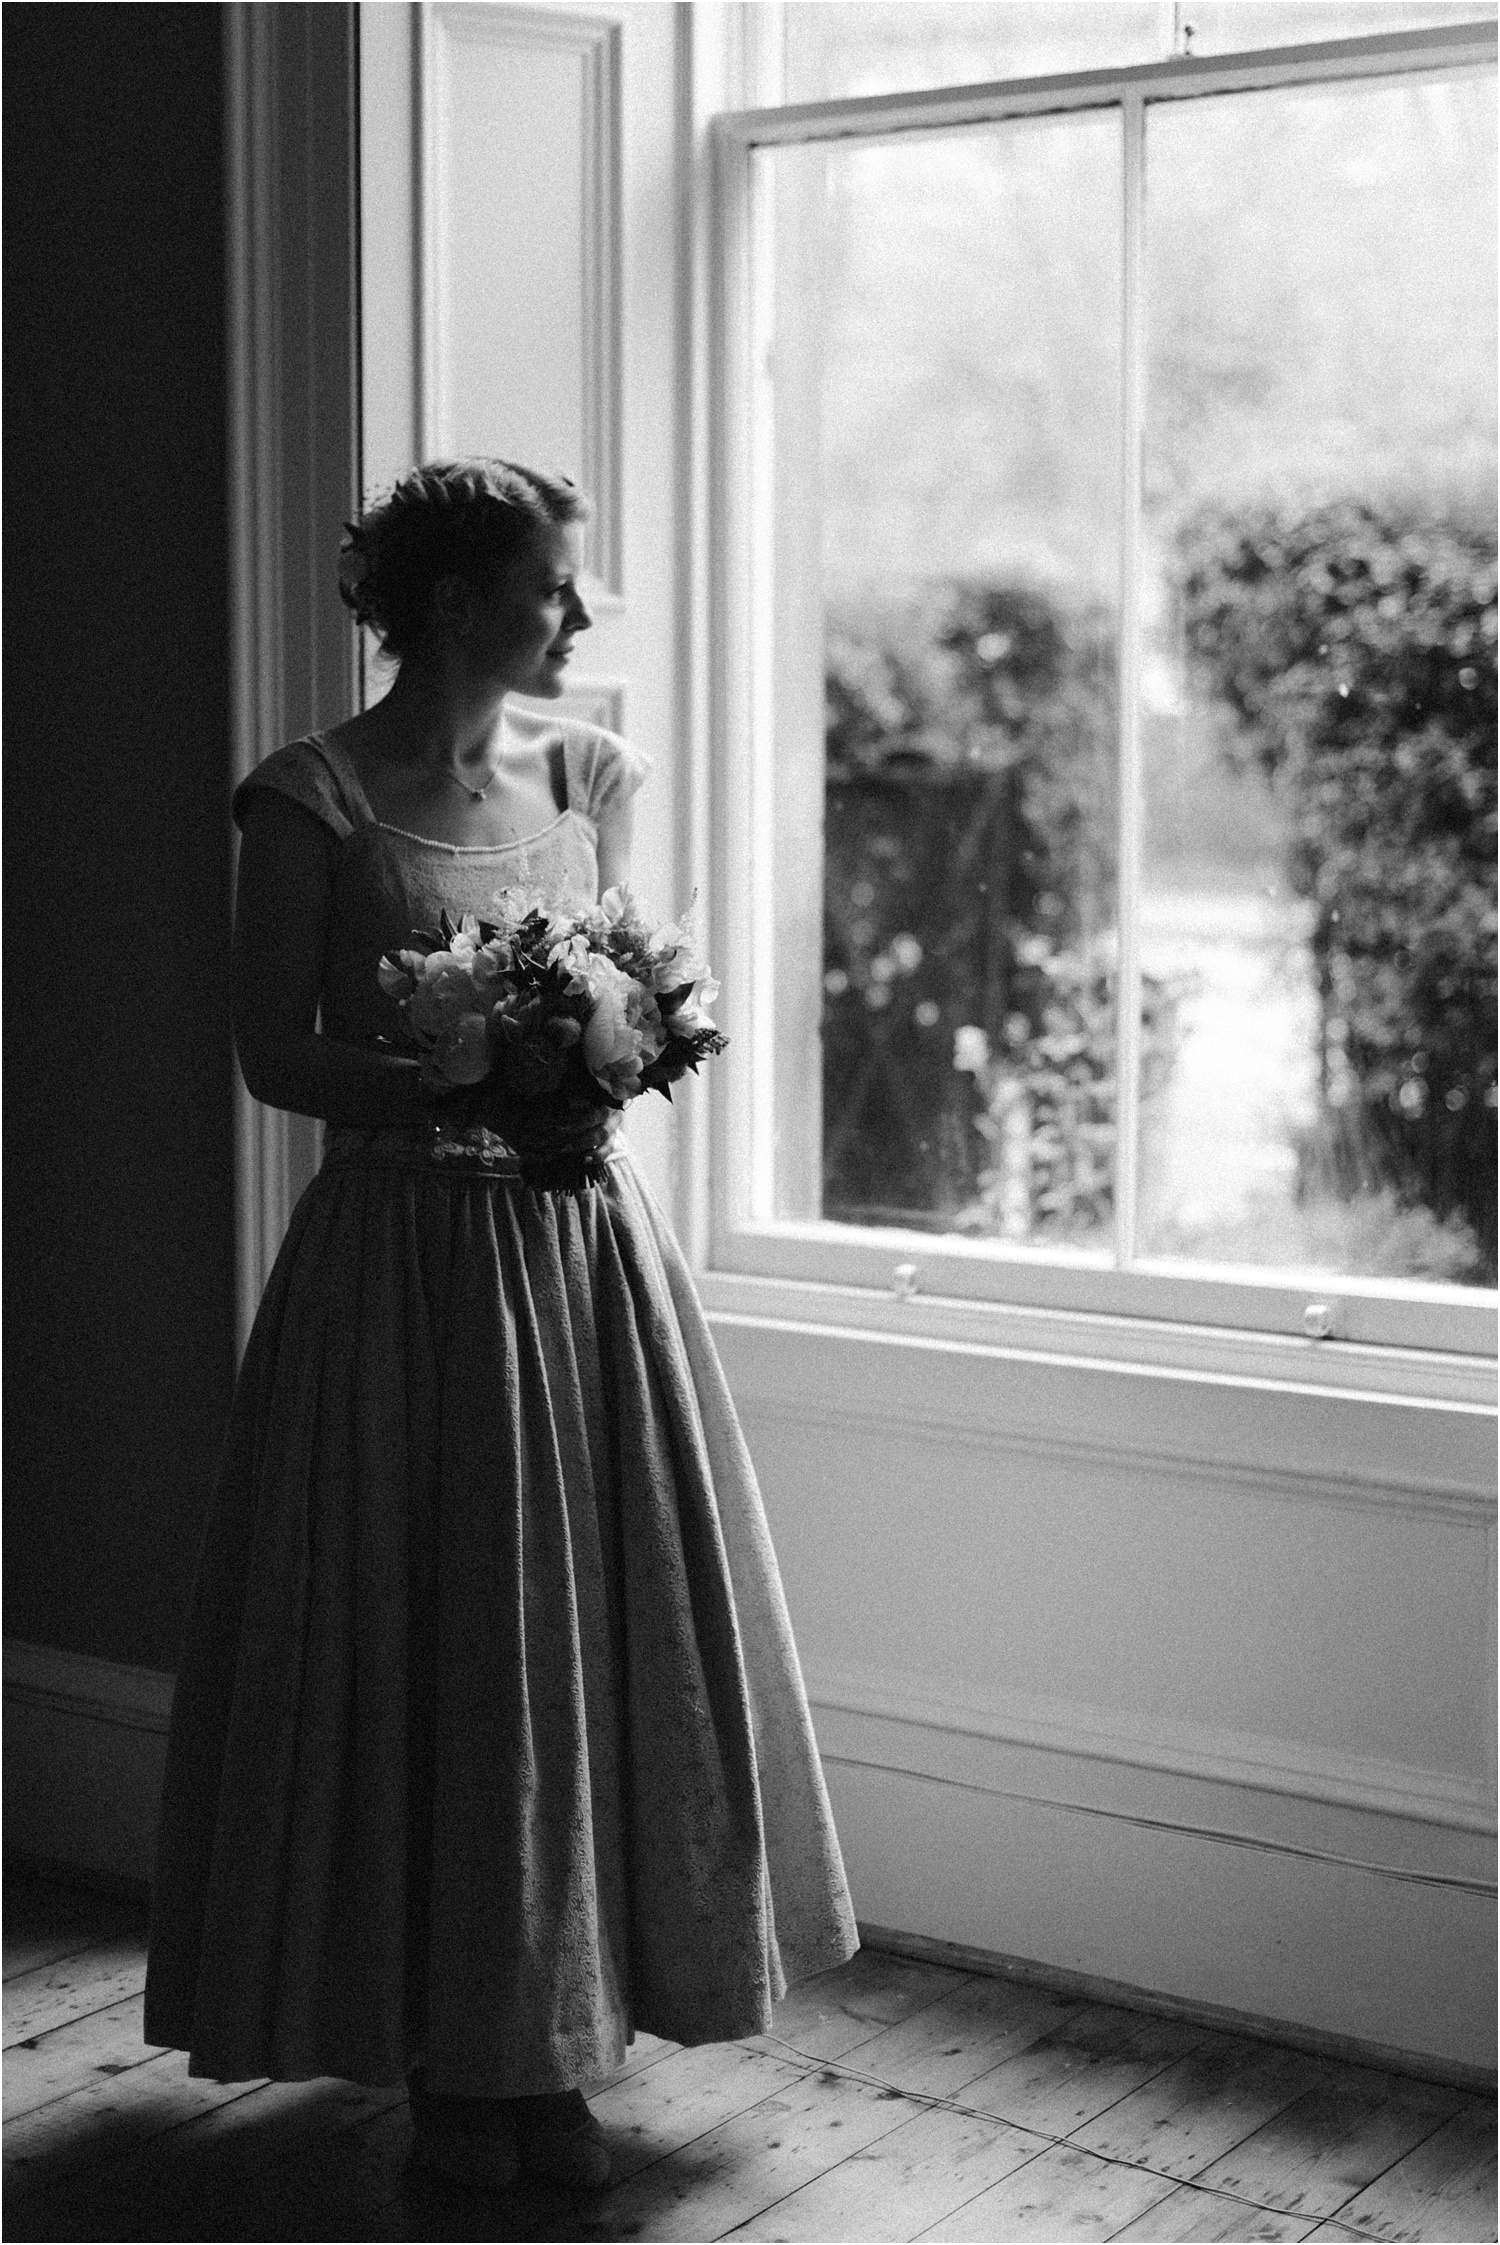 National-Museum-of-Scotland-Edinburgh-Wedding-Photography_0012.jpg